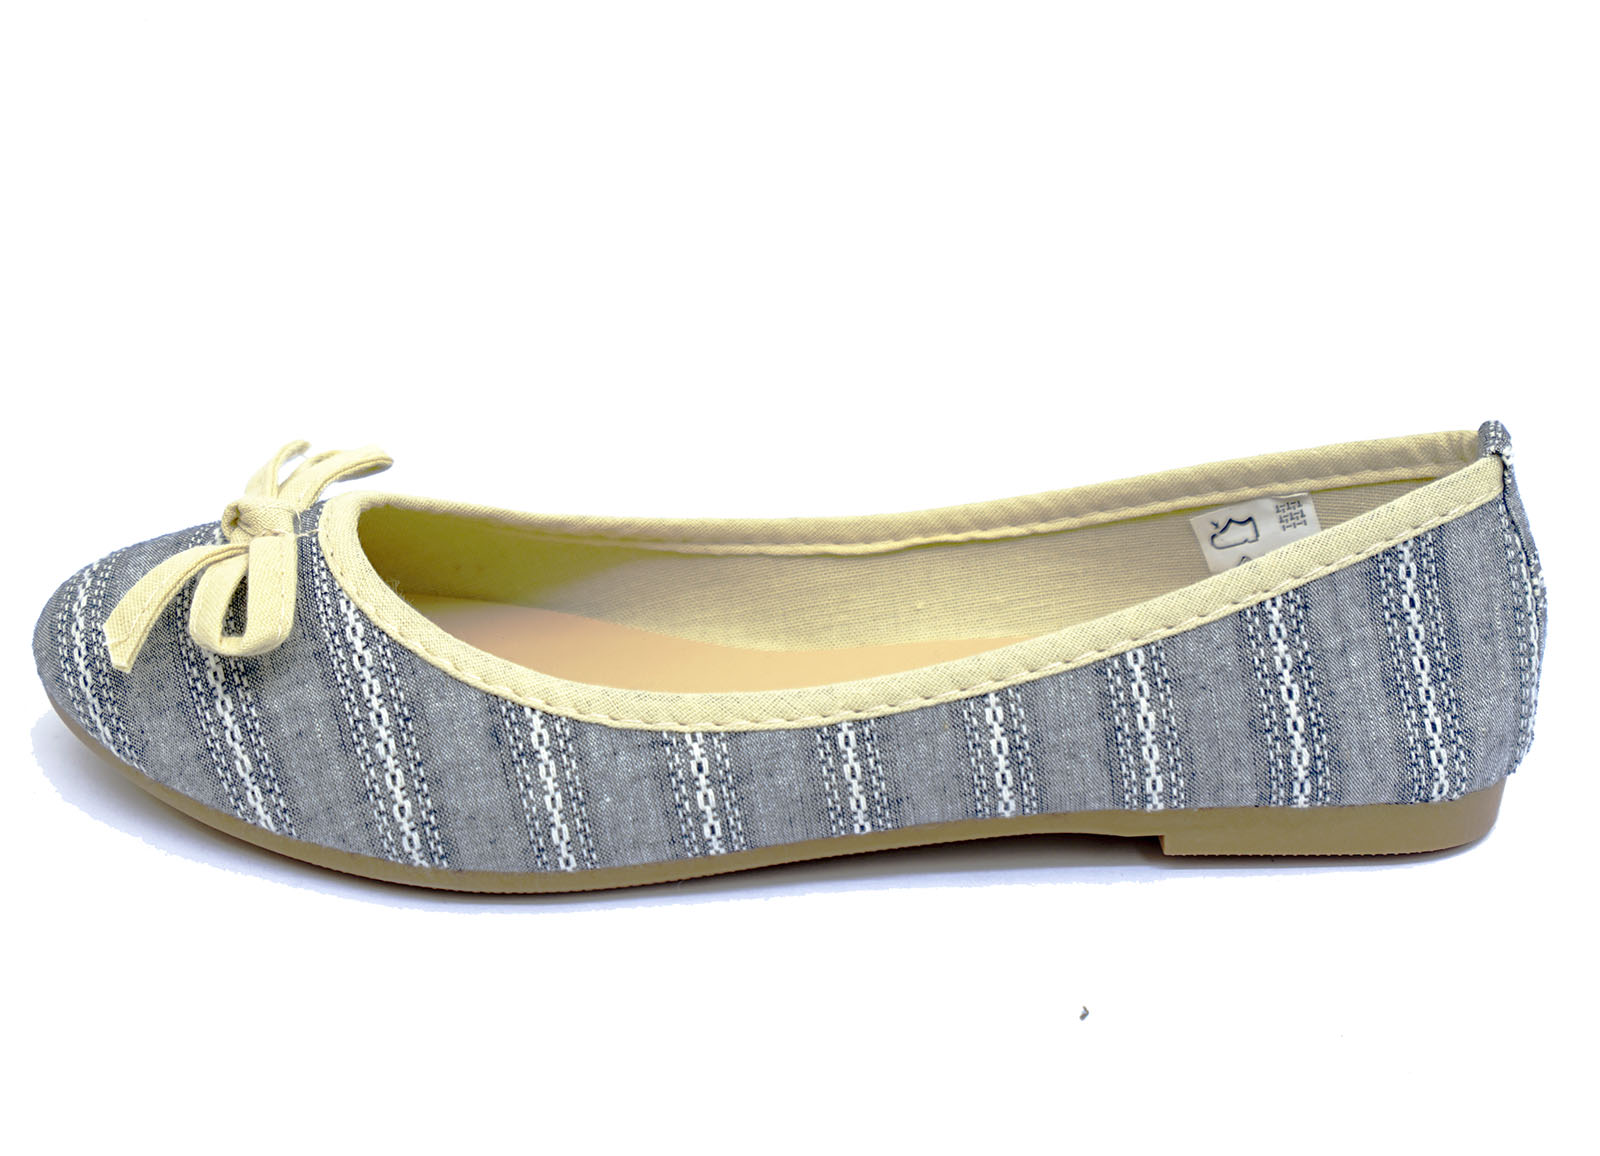 Señoras Sin Cordones Plana Cómoda Ballet Bailarina Bombas Dolly Trabajo Niñas Zapatos UK 3-9